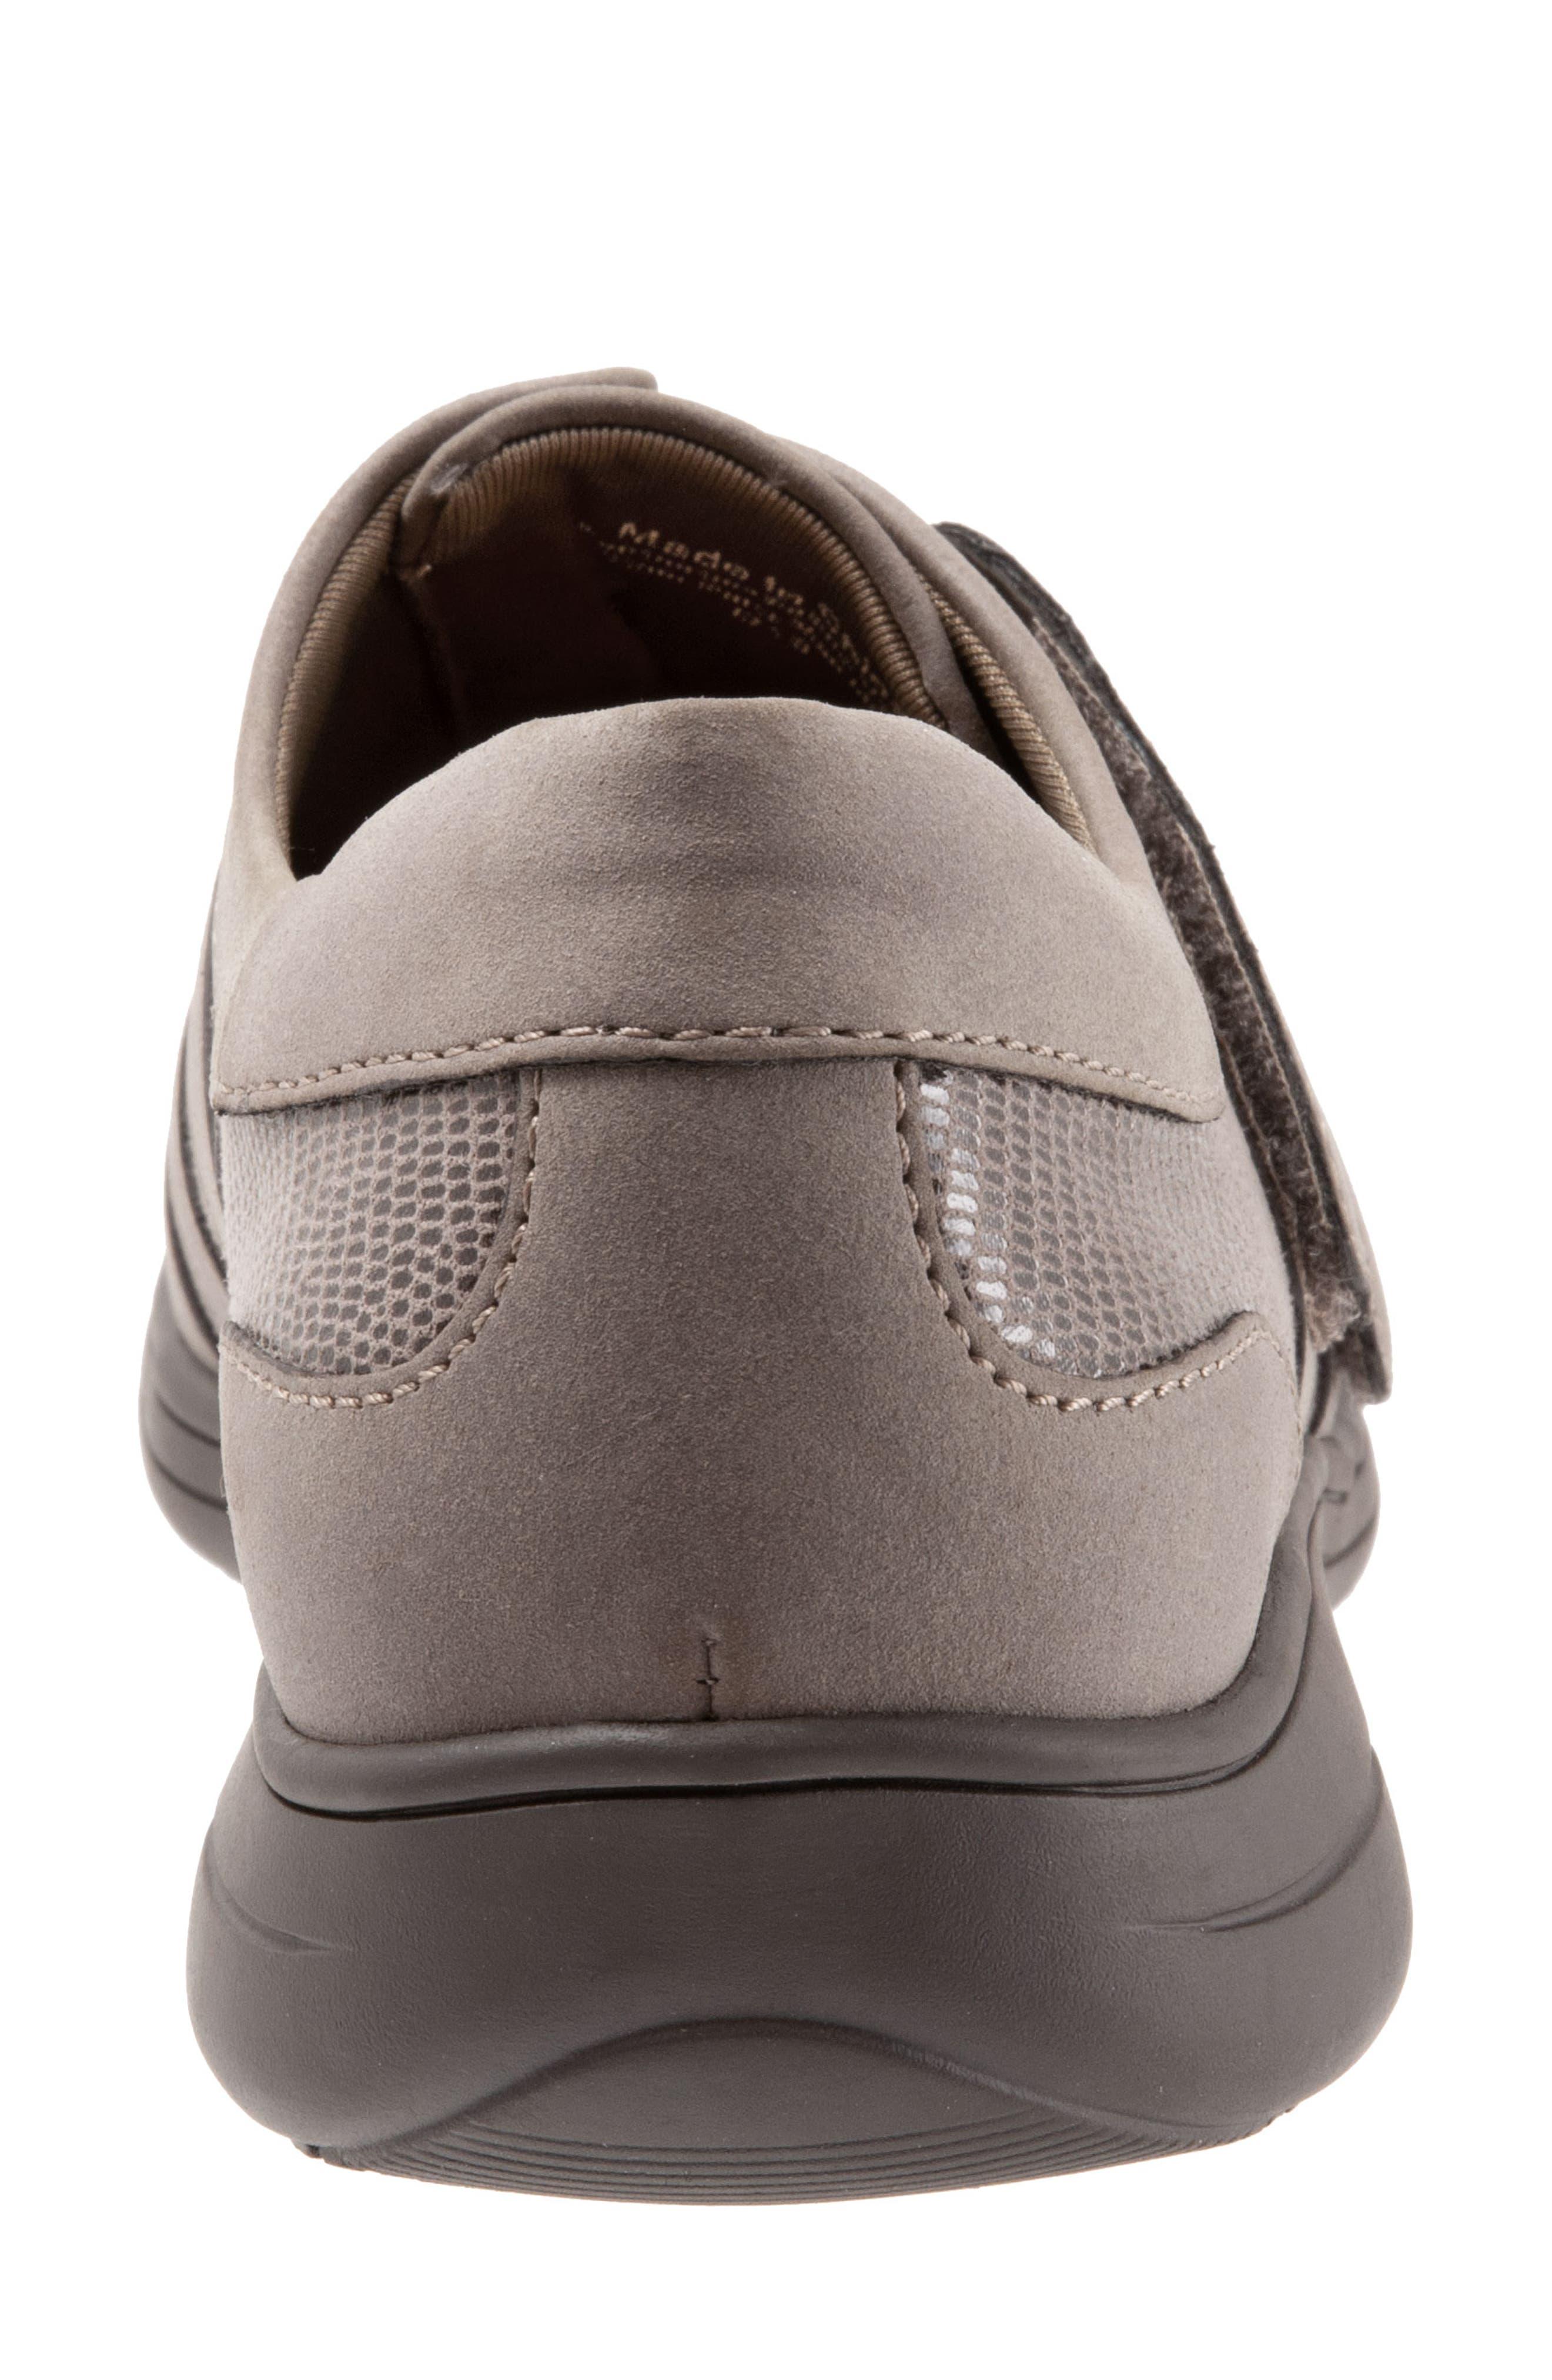 Joy Slip-On Sneaker,                             Alternate thumbnail 7, color,                             TAUPE LEATHER